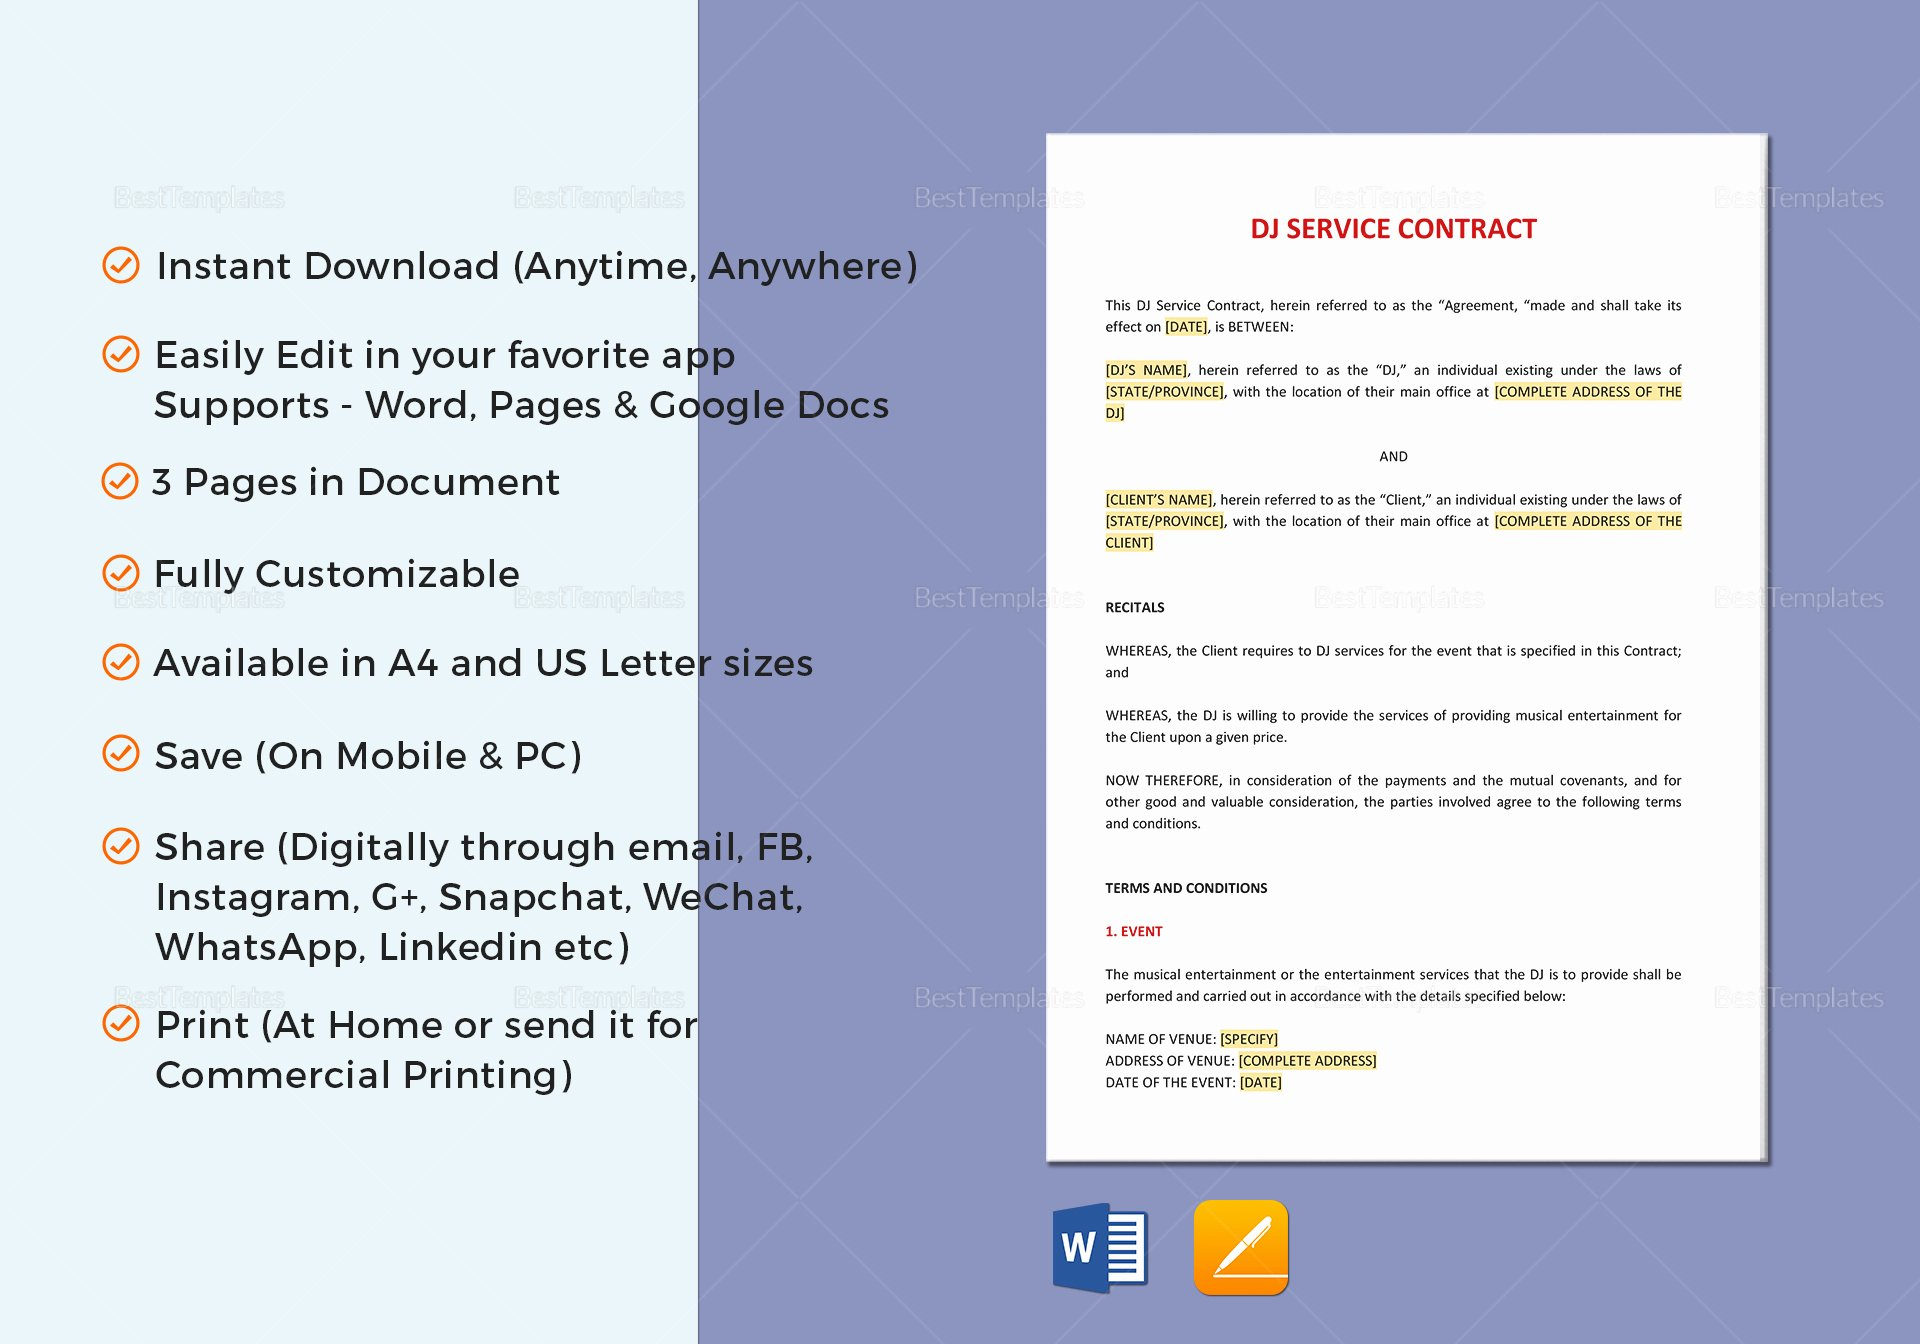 Contract Template Google Docs New Dj Service Contract Template In Word Google Docs Apple Pages